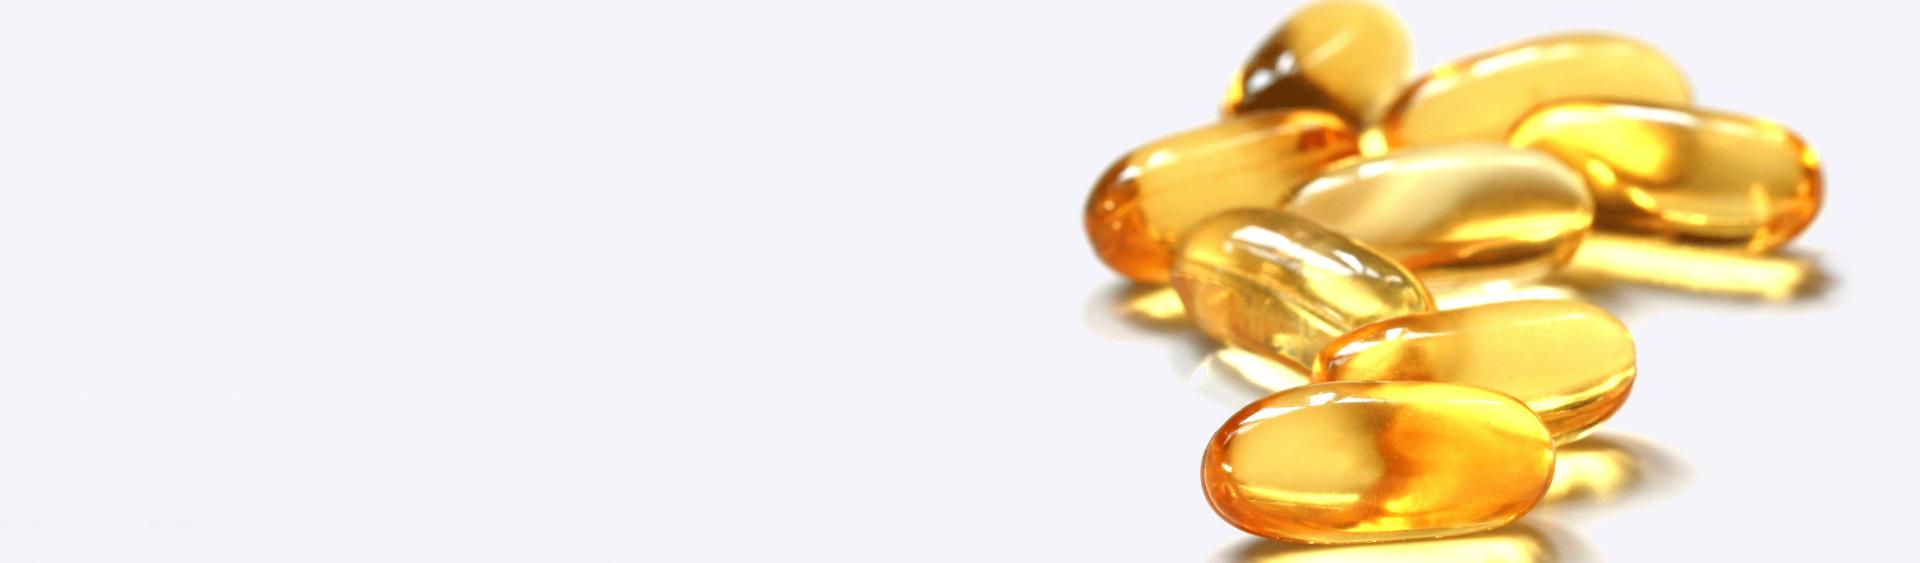 integratori-vitamine-sali-parafarmacia